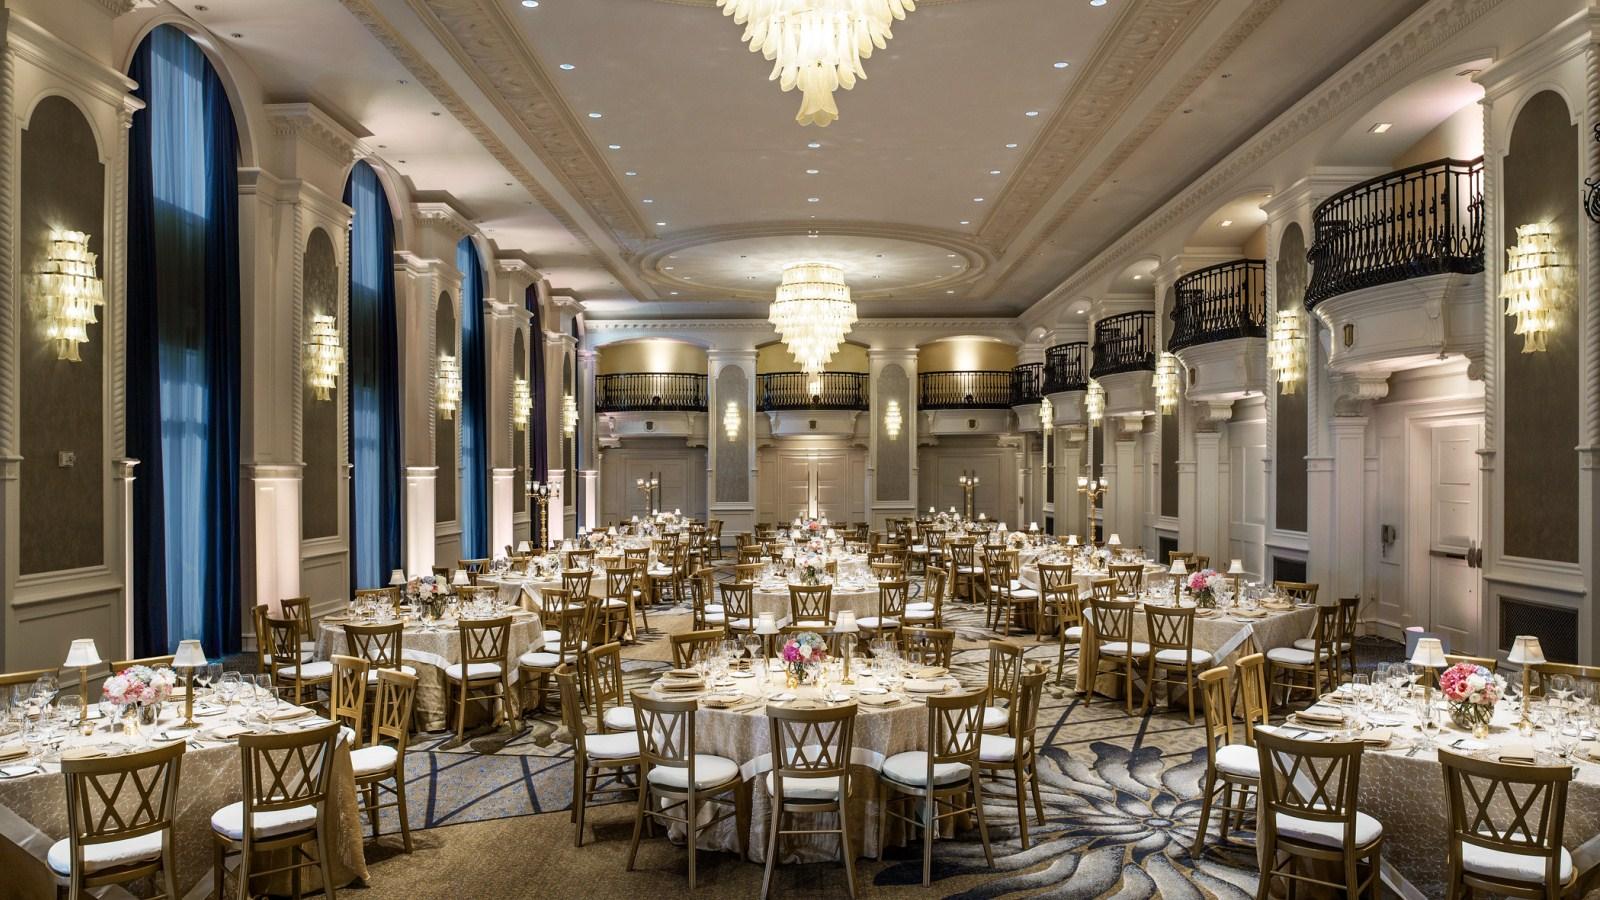 Detroit MI Wedding Venues The Westin Book Cadillac Detroit